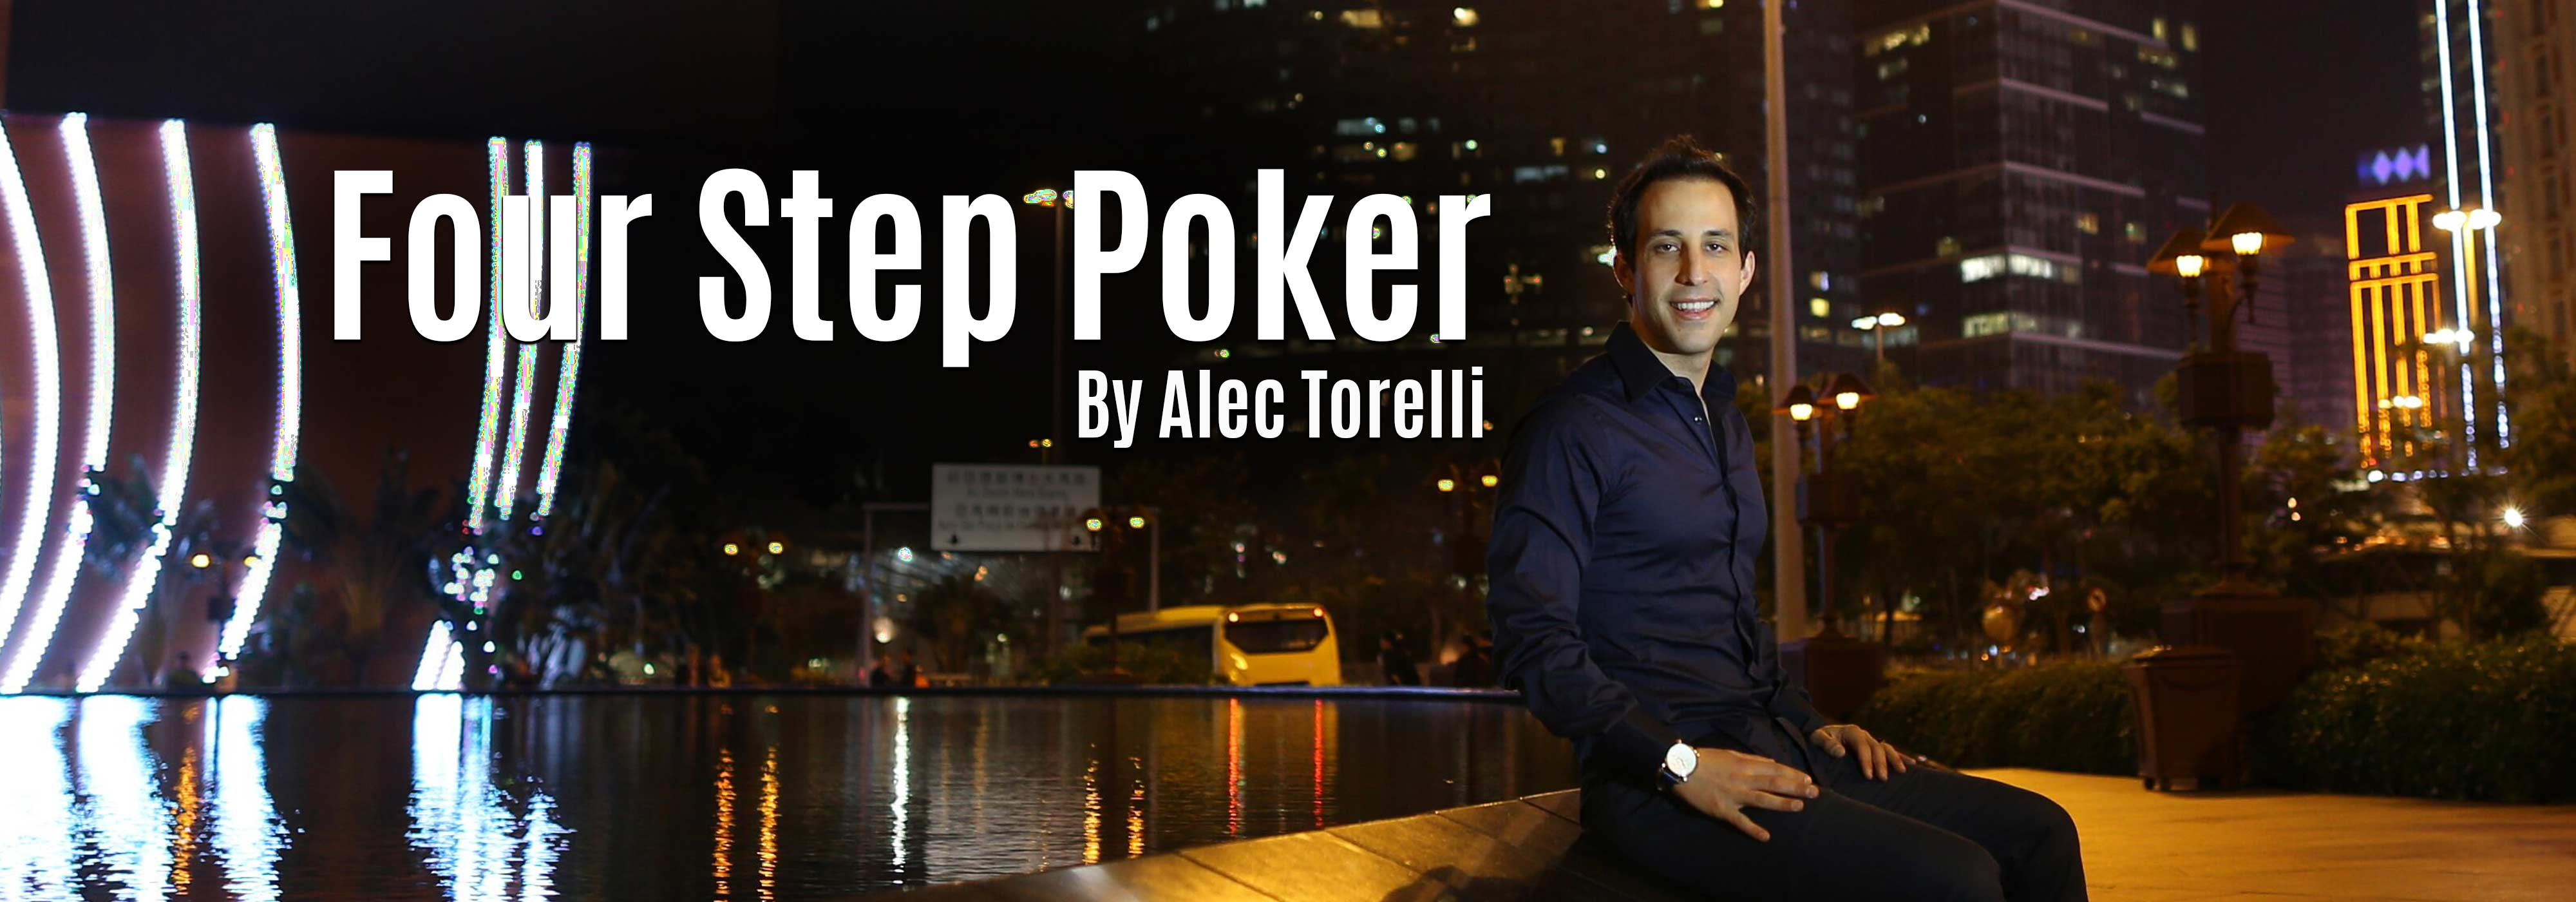 four-step-poker-torelli